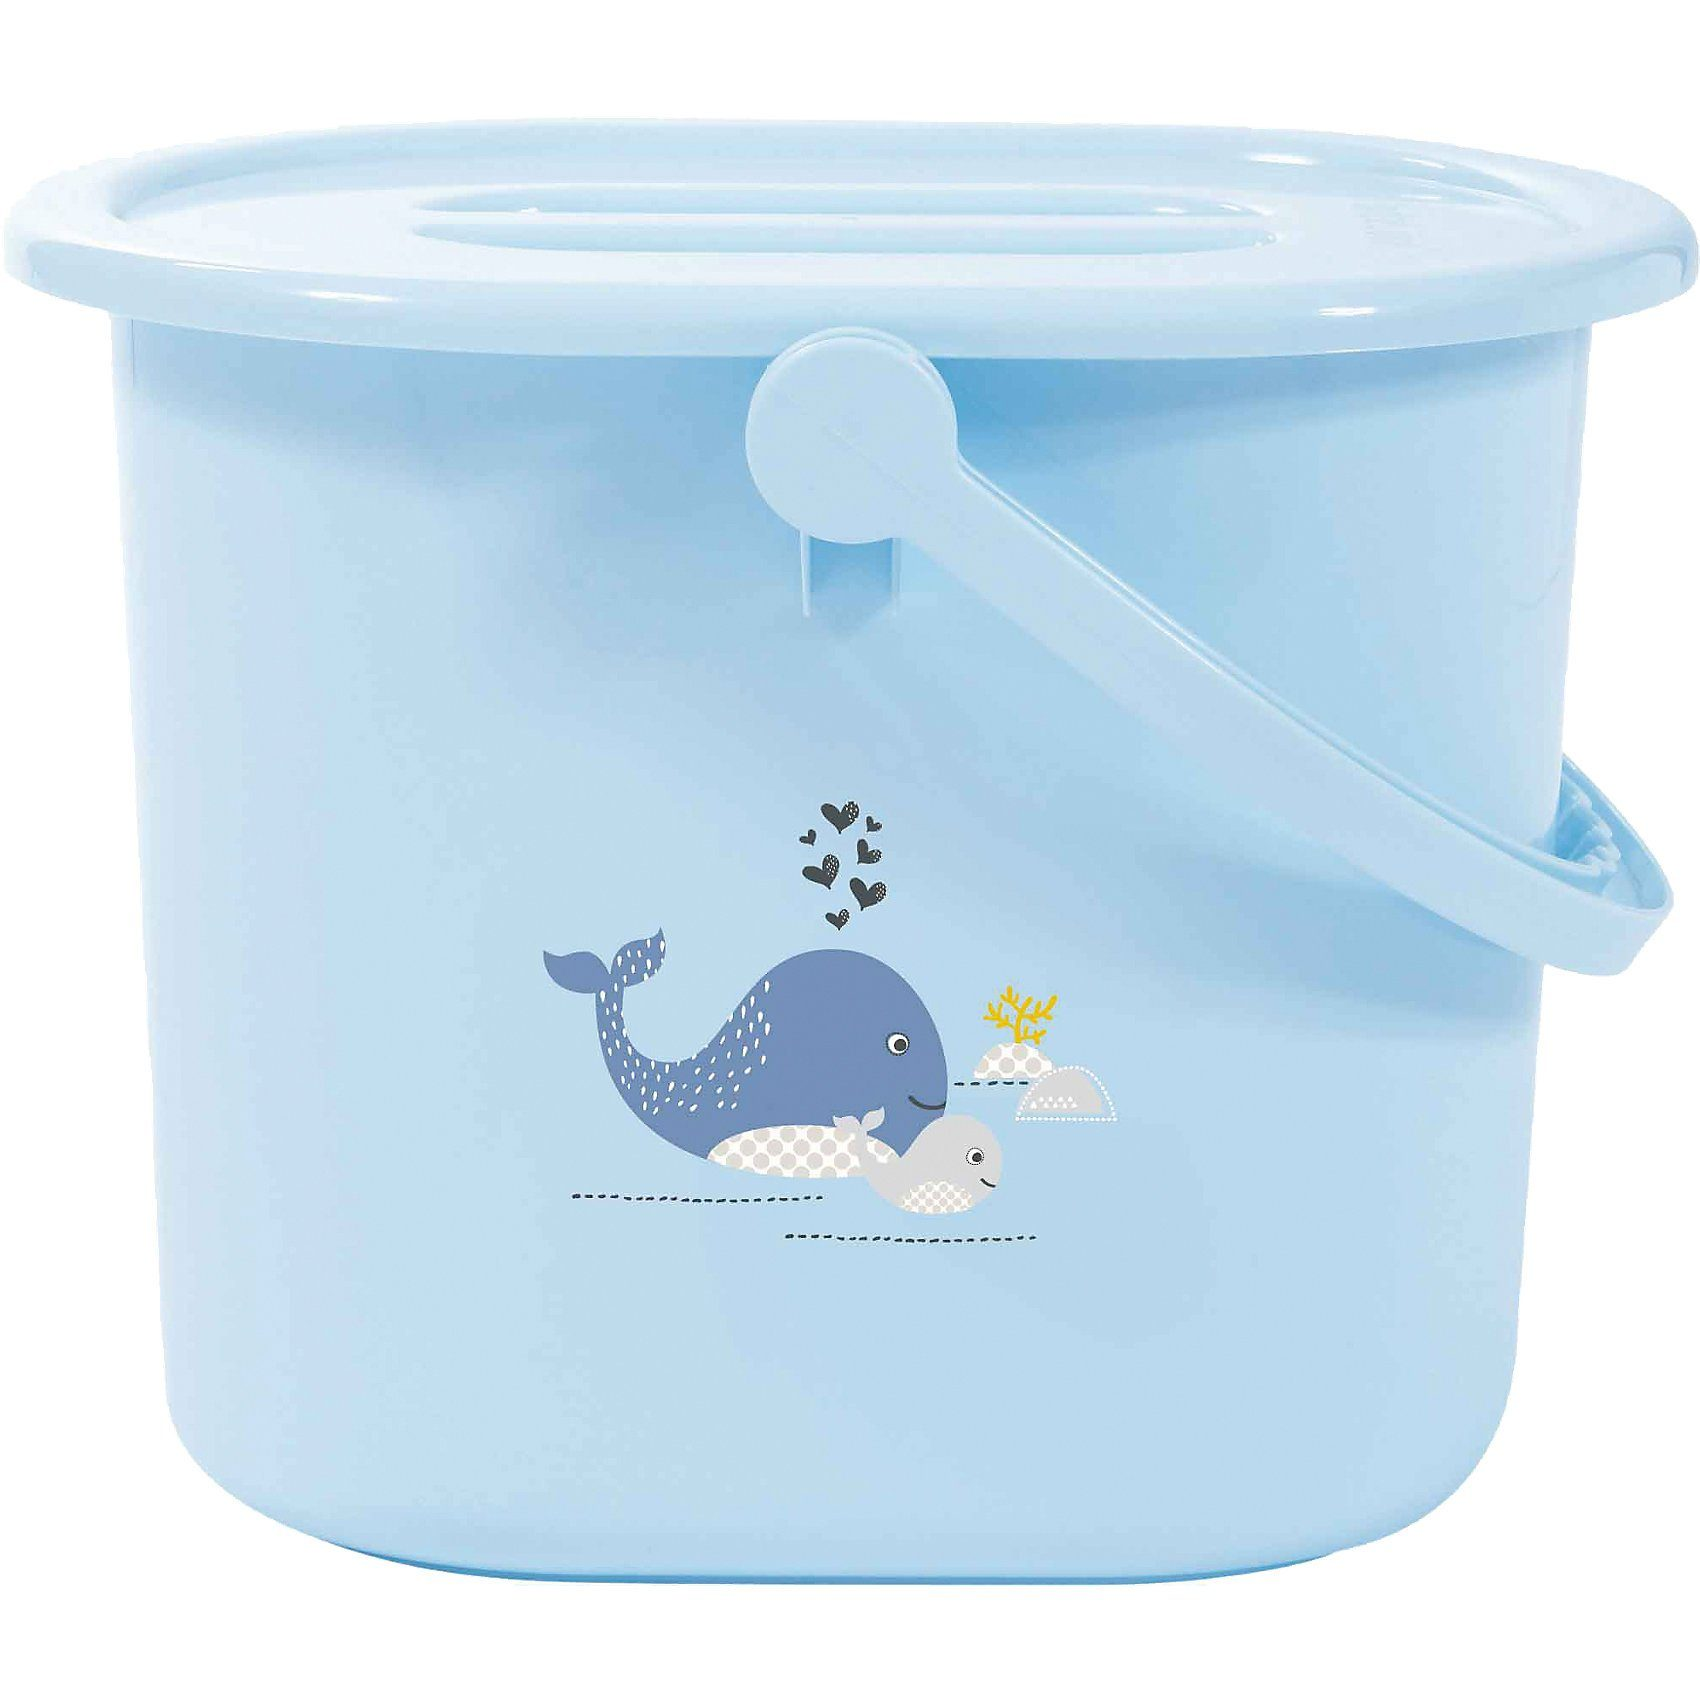 bébé-jou Windeleimer Wally Whale, blau